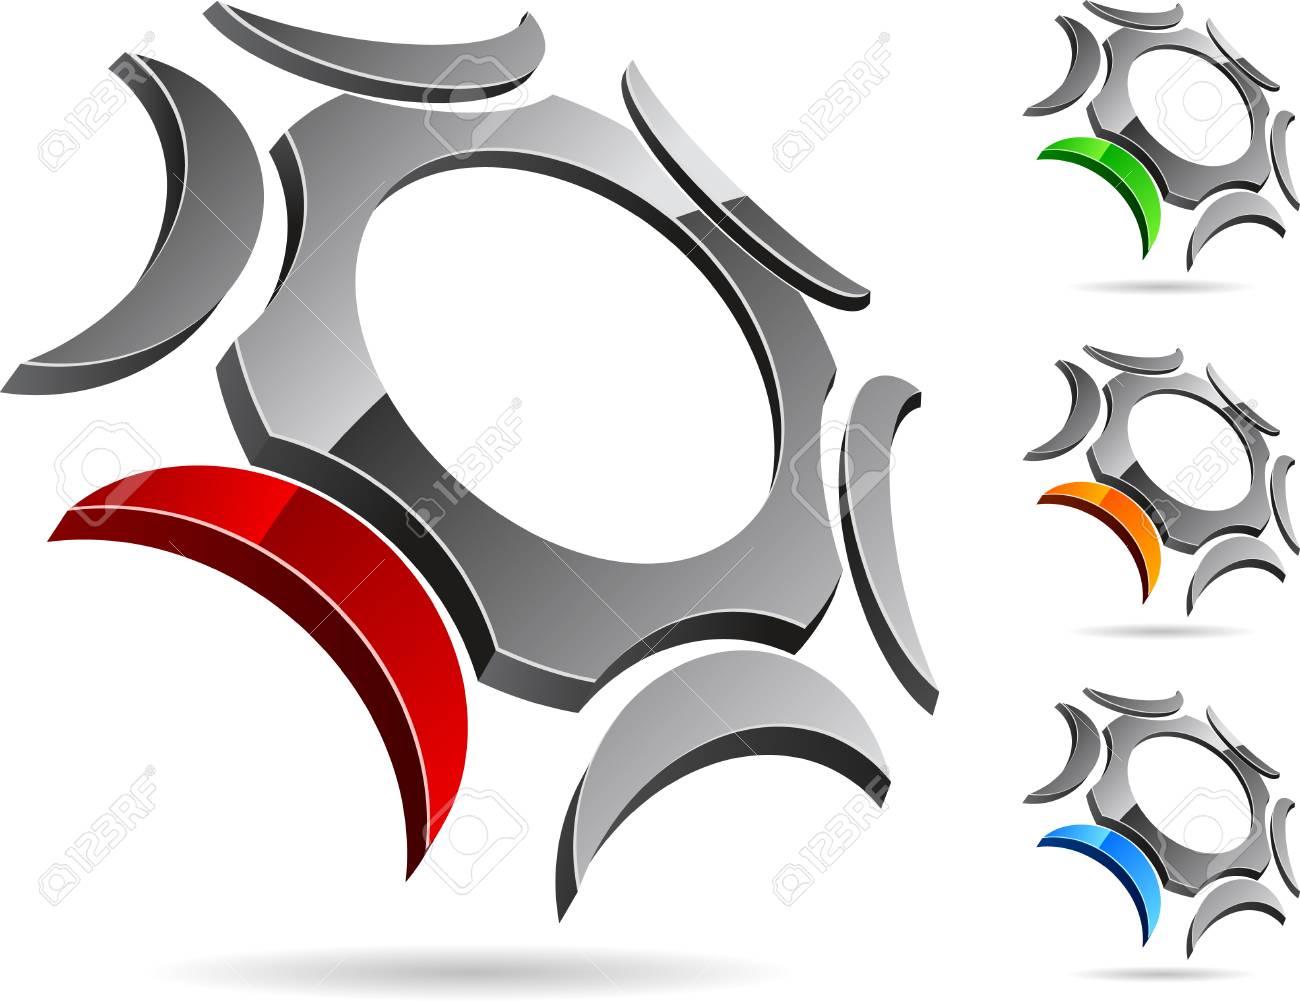 Abstract company symbol. Vector illustration. Stock Vector - 5212922